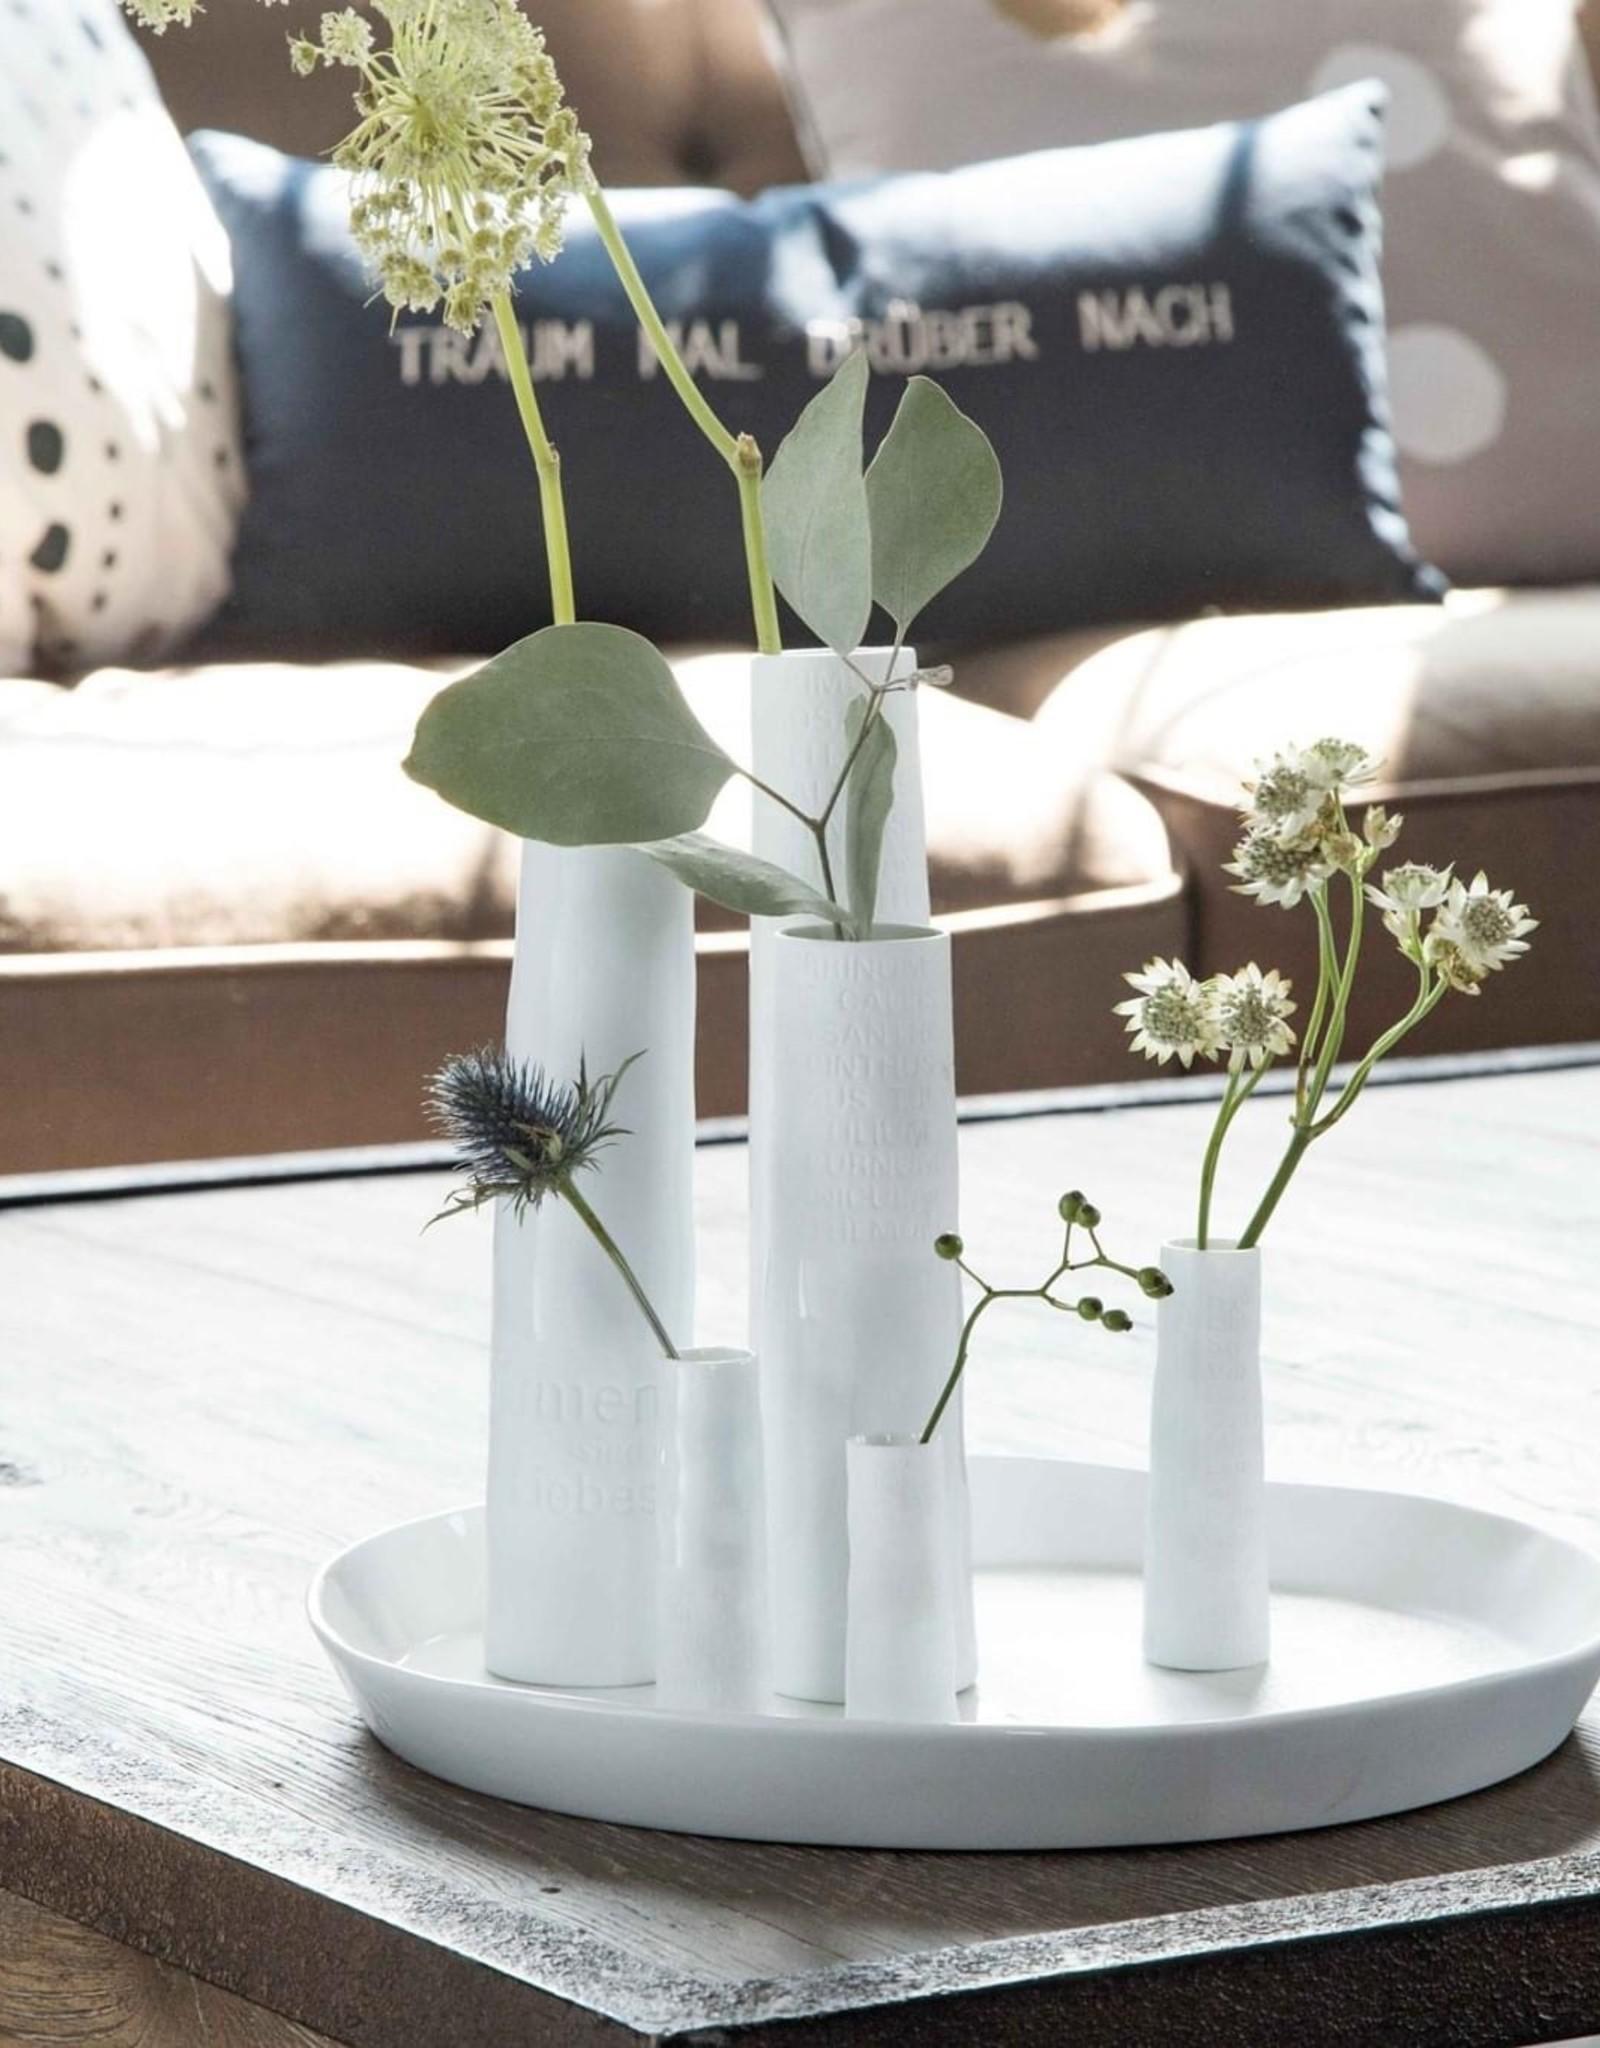 Räder Rader - Room poetry, Vase Small